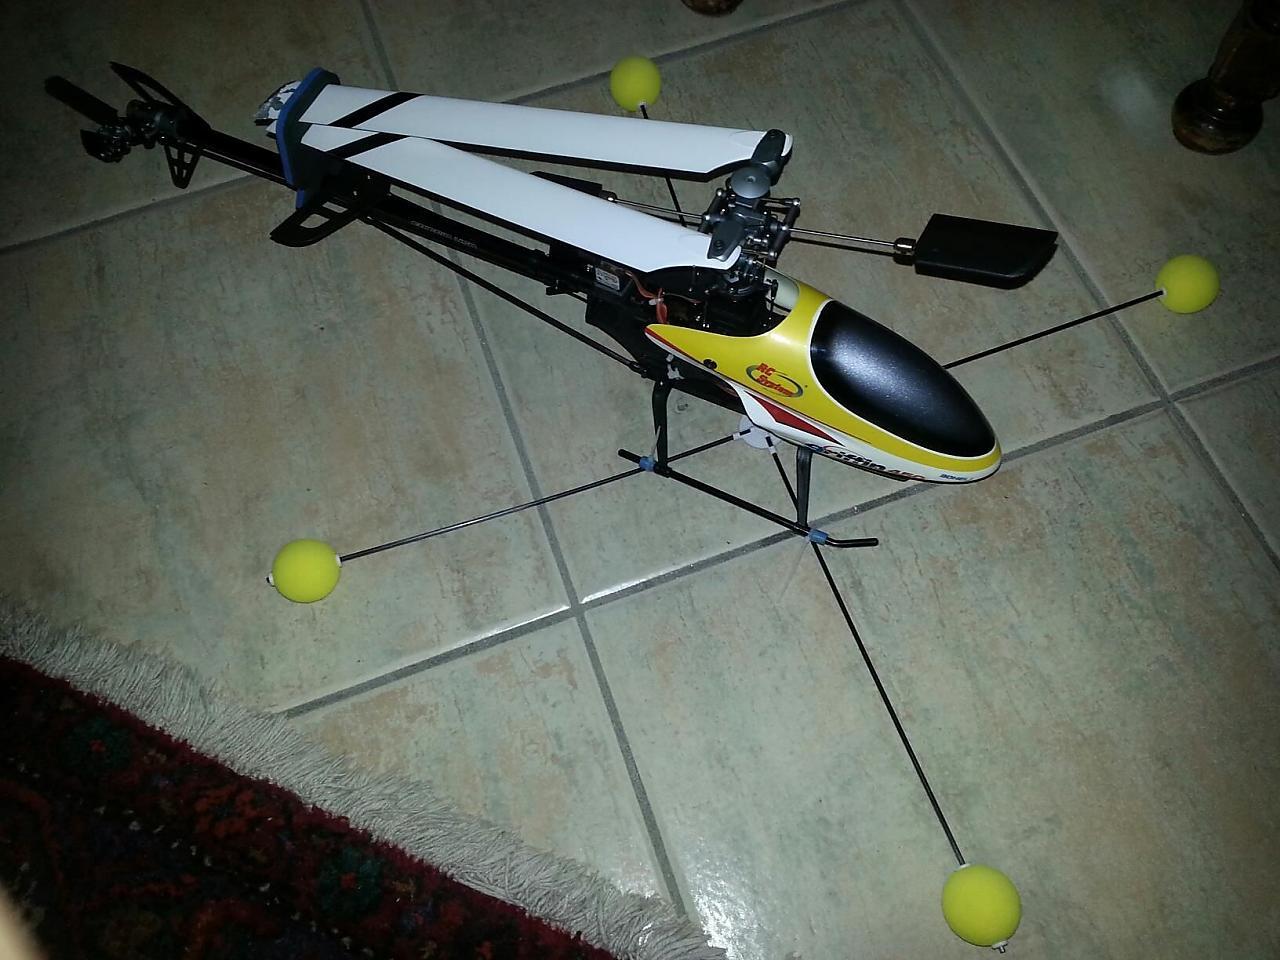 Elicottero 450 : Elicottero griffin 450 nuovo! baronerosso.it forum modellismo